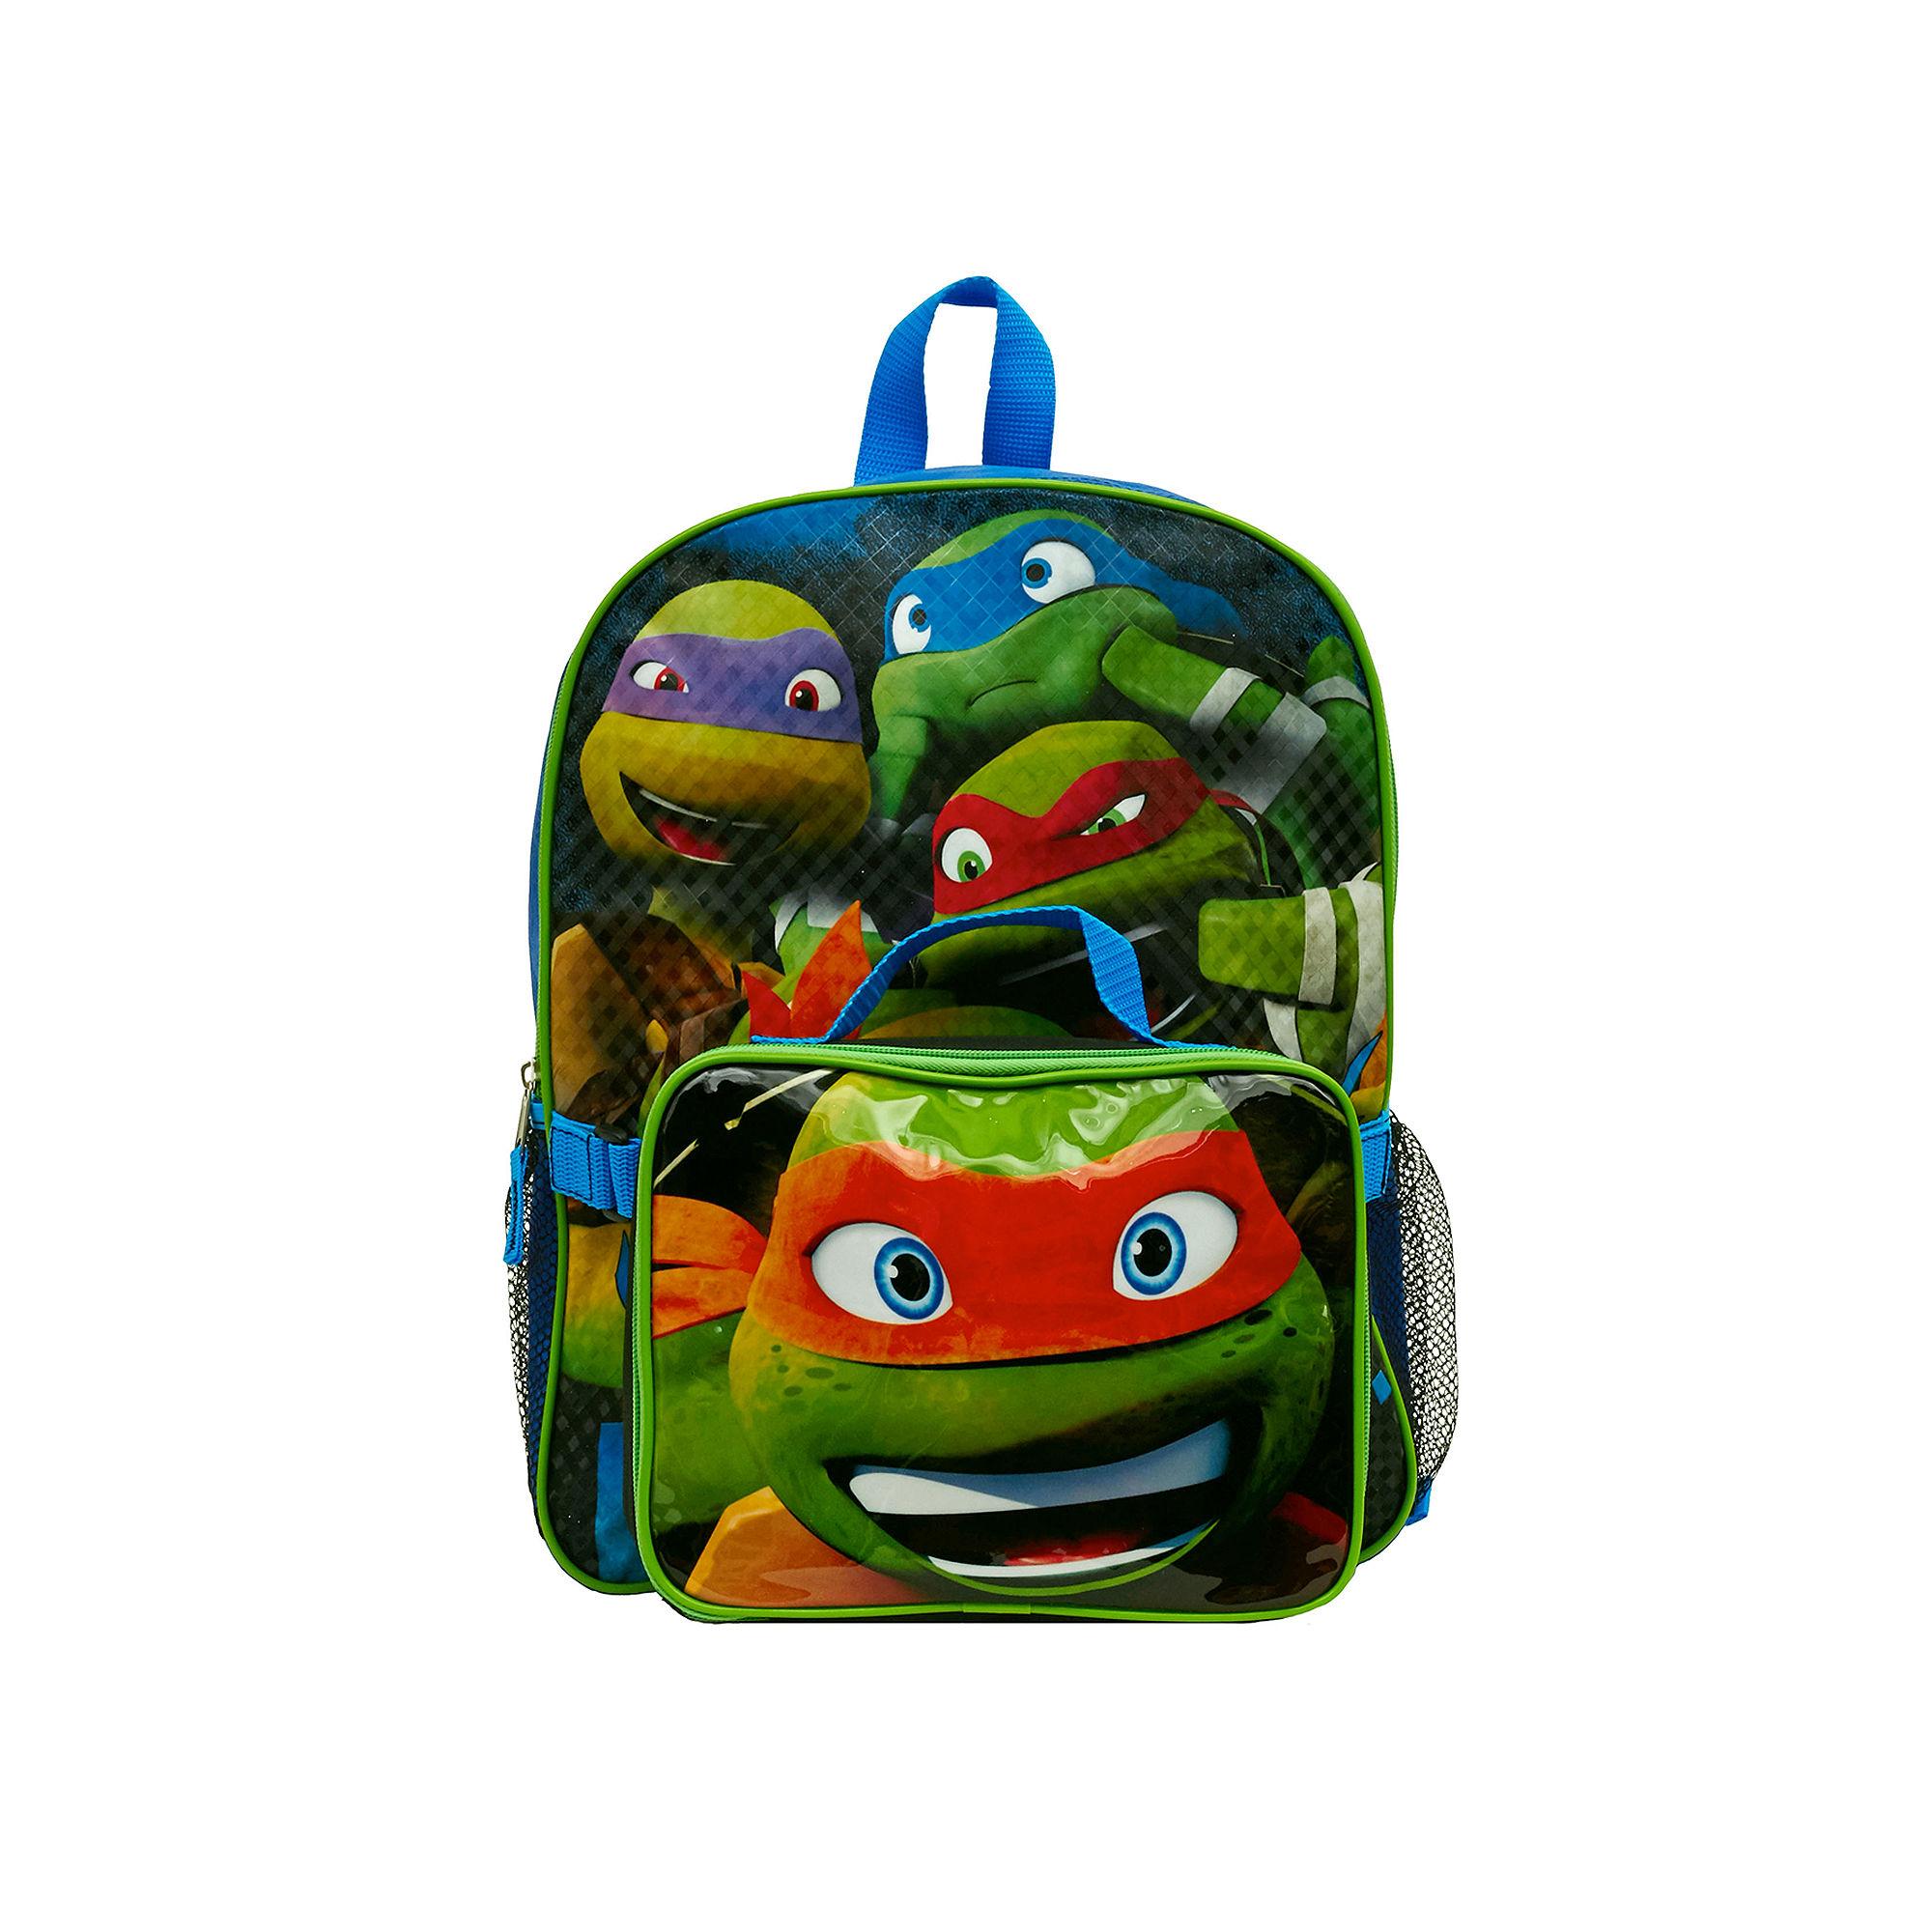 "Teenage Mutant Ninja Turtles ""Buyacha"" Boys' Backpack with Lunch Kit"